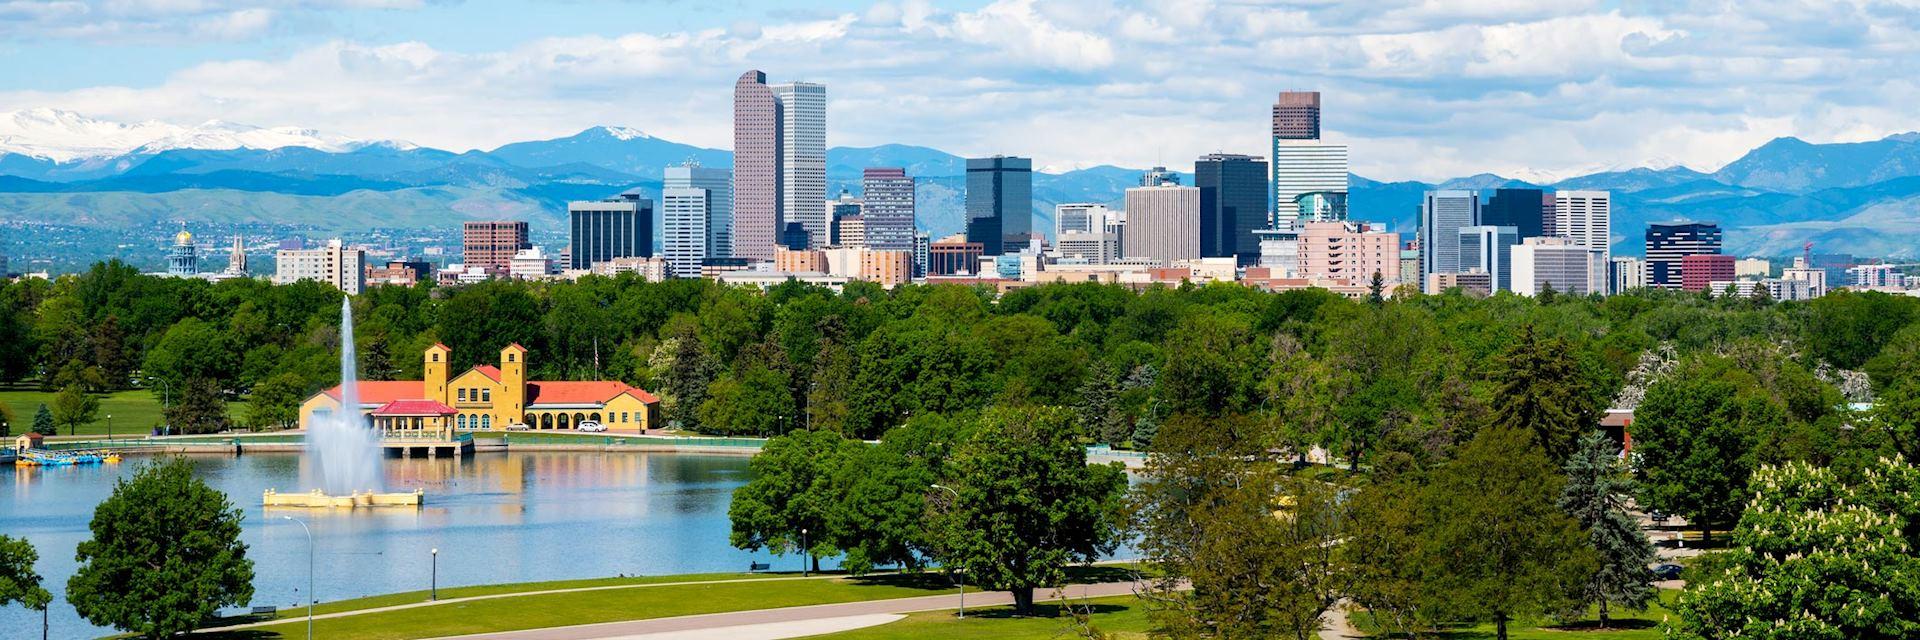 Downtown Denver, the USA